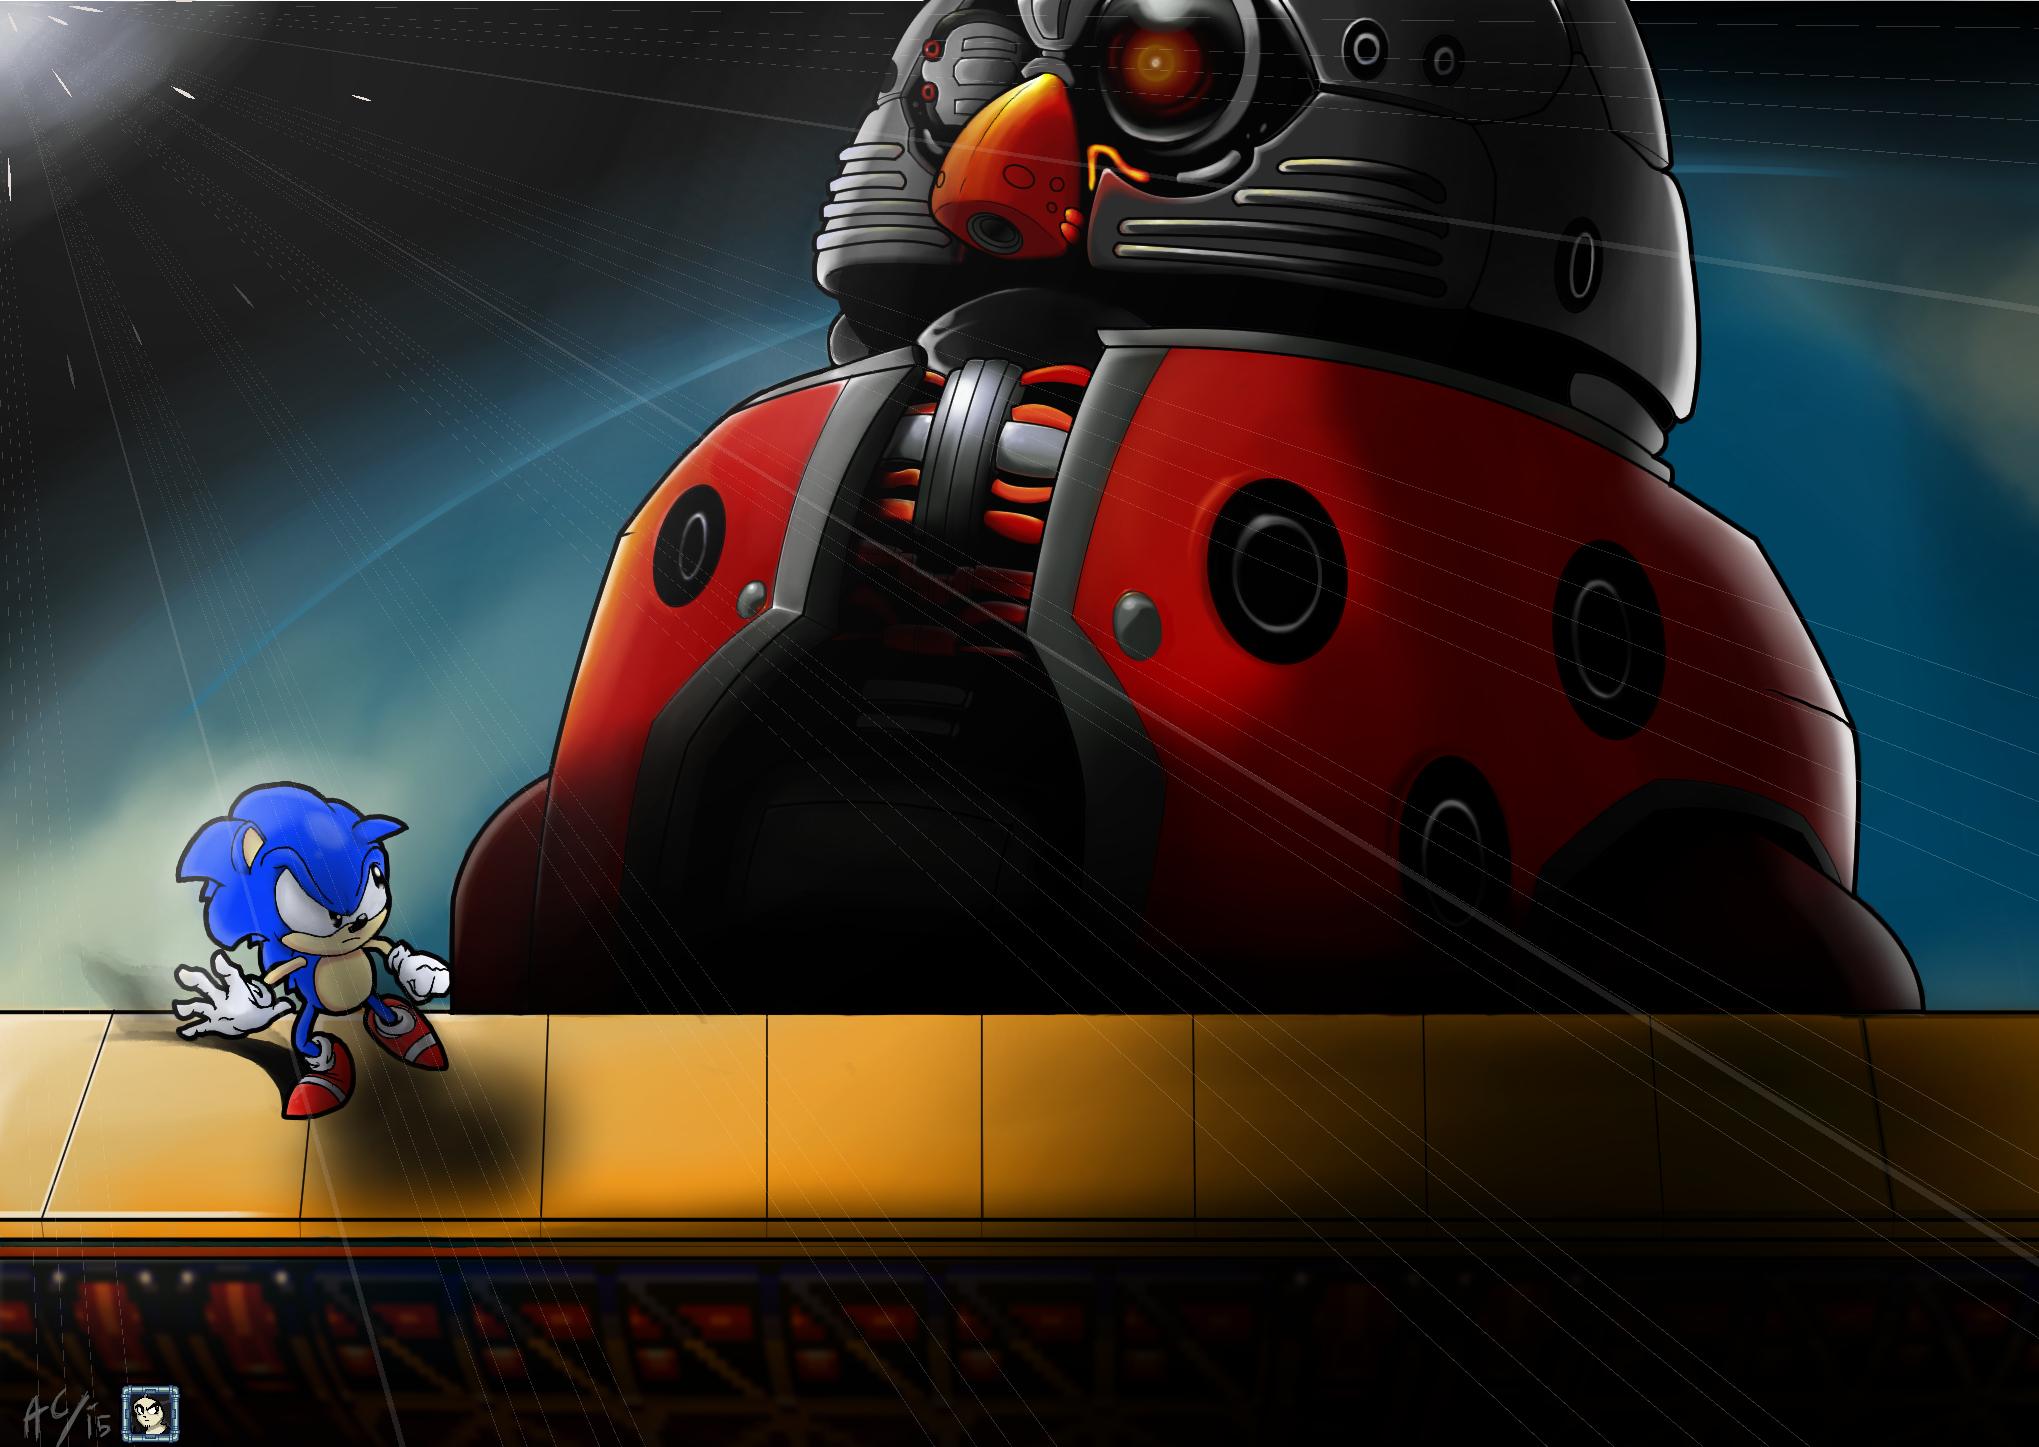 Sonic 3 - The Death Egg Robo